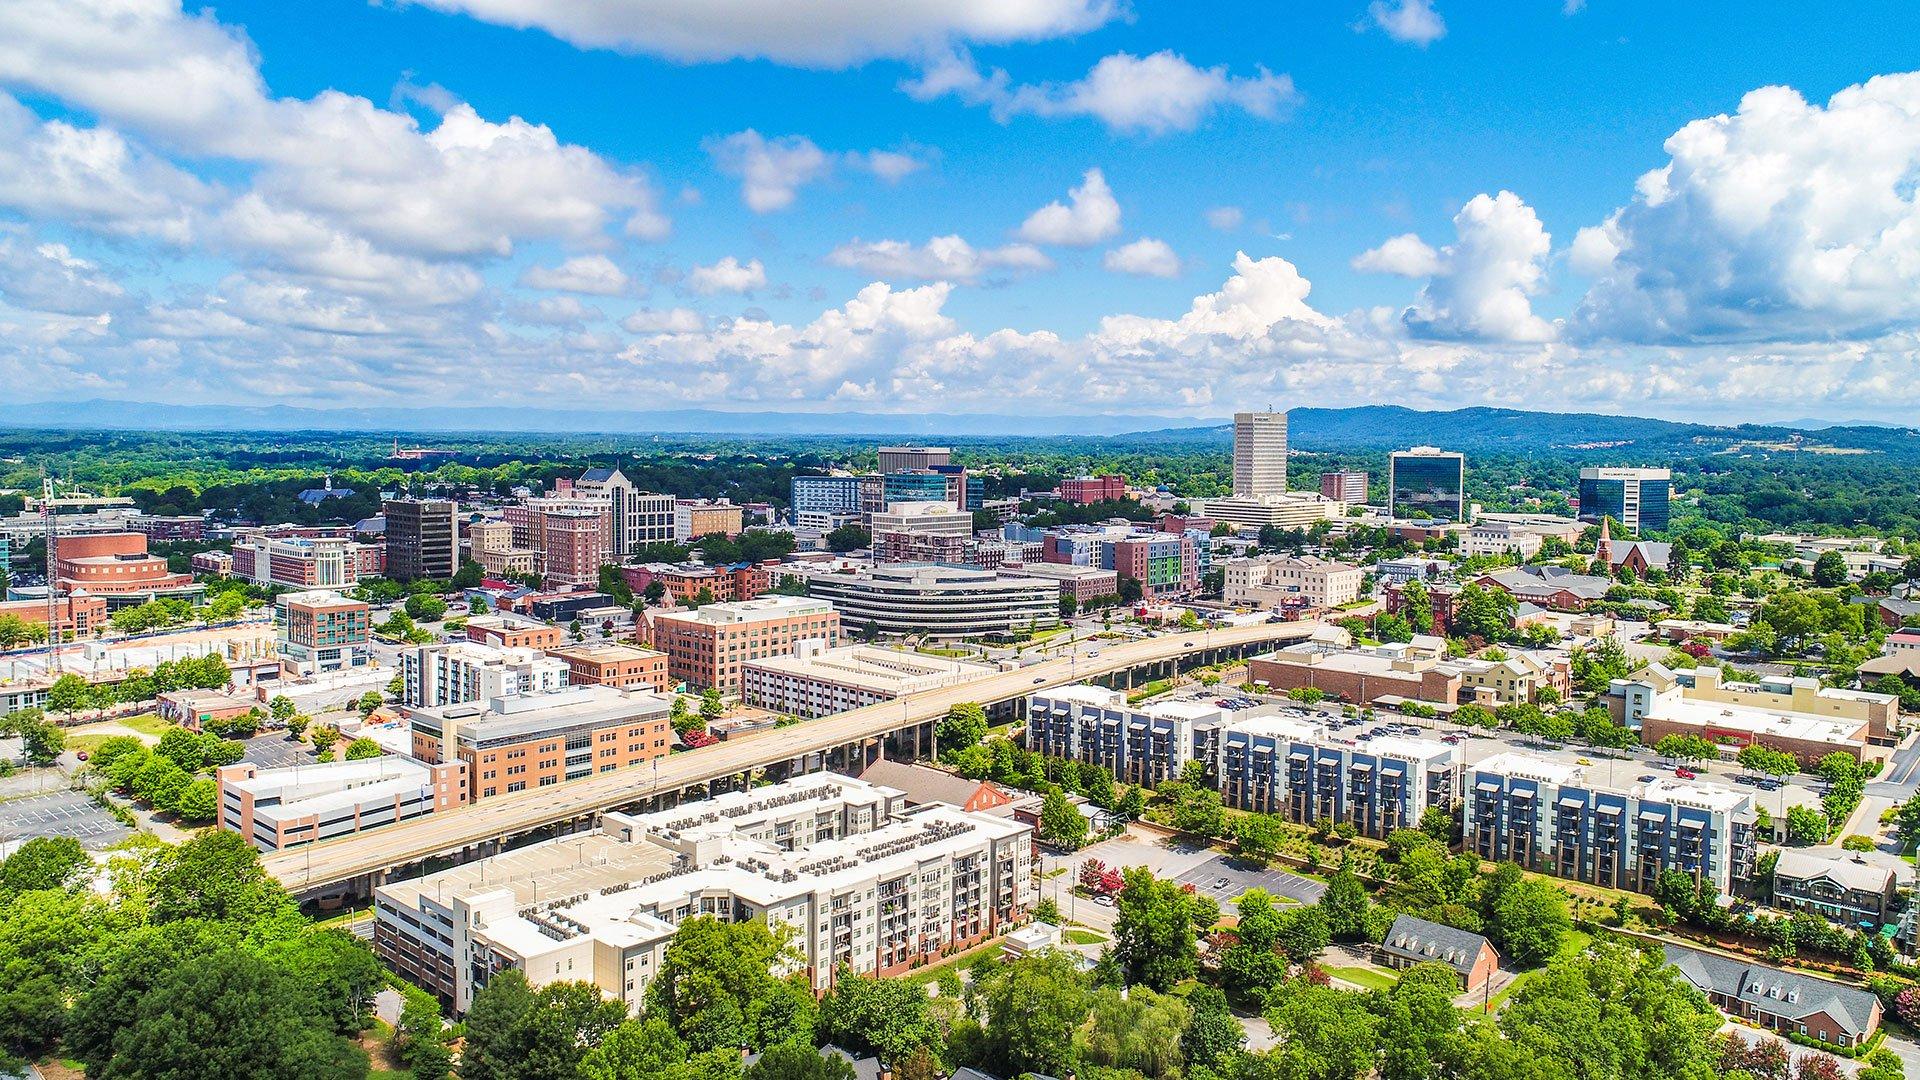 Aerial of Greenville, SC (Adobe Stock photo)